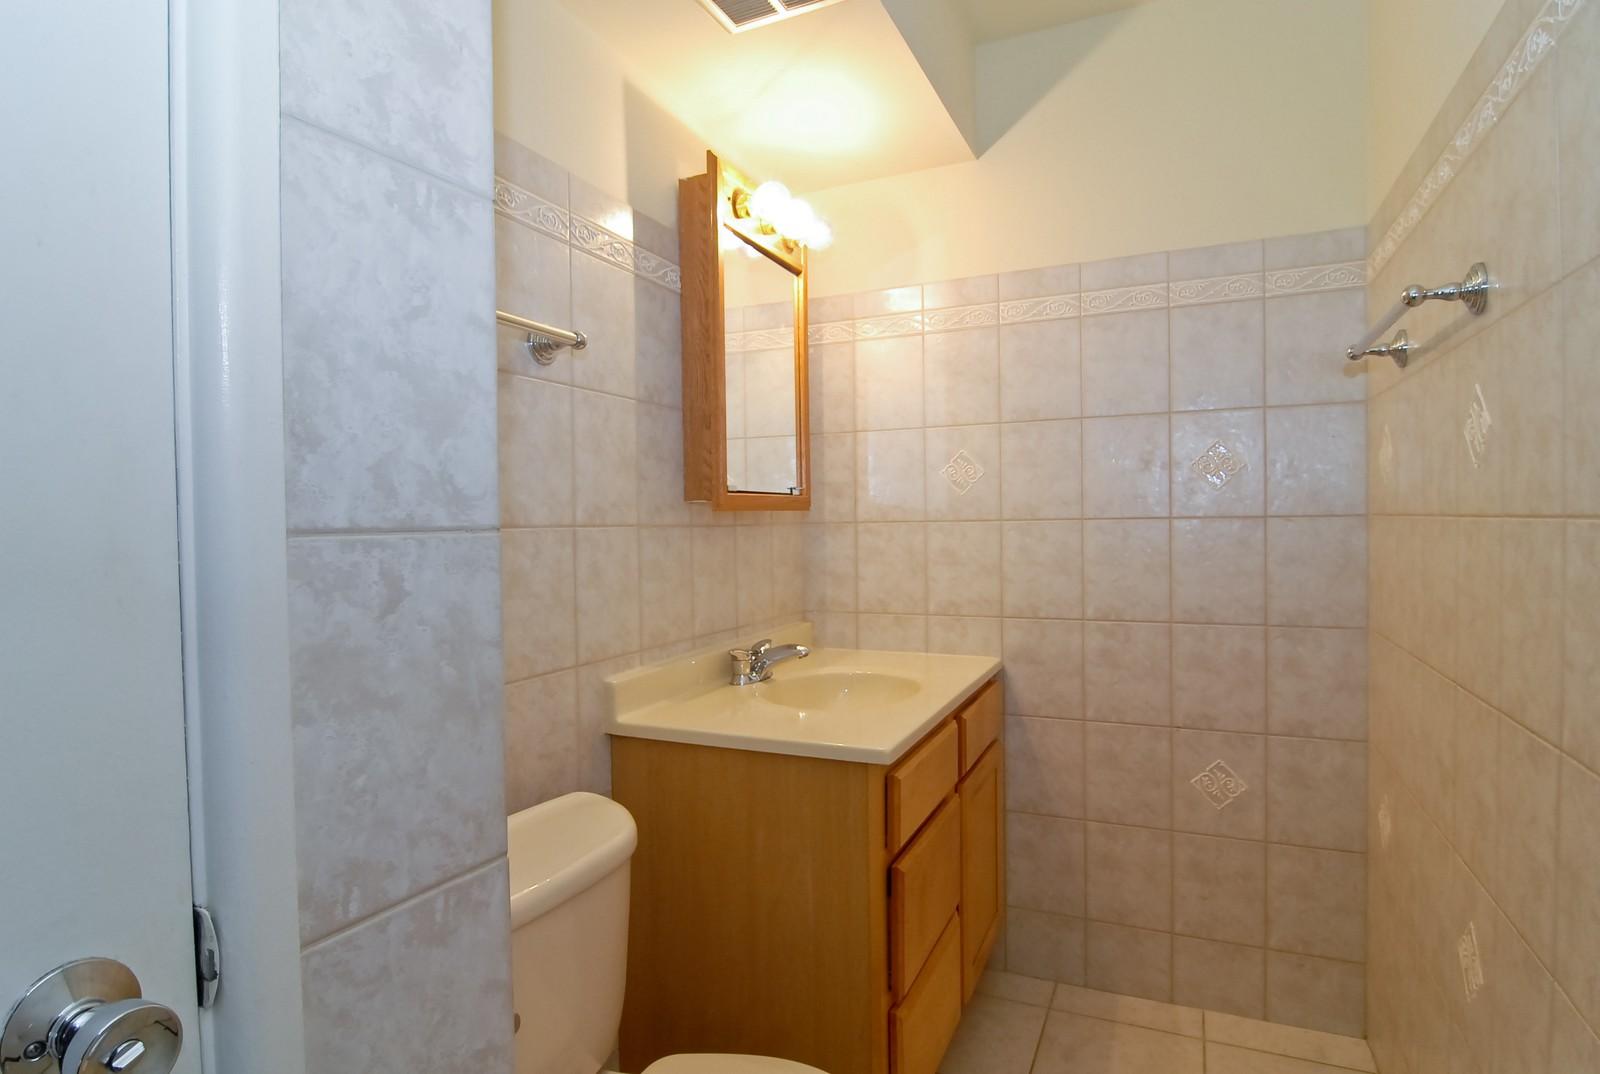 Real Estate Photography - 800 Washington Blvd, Unit 402, Oak Park, IL, 60302 - Bathroom